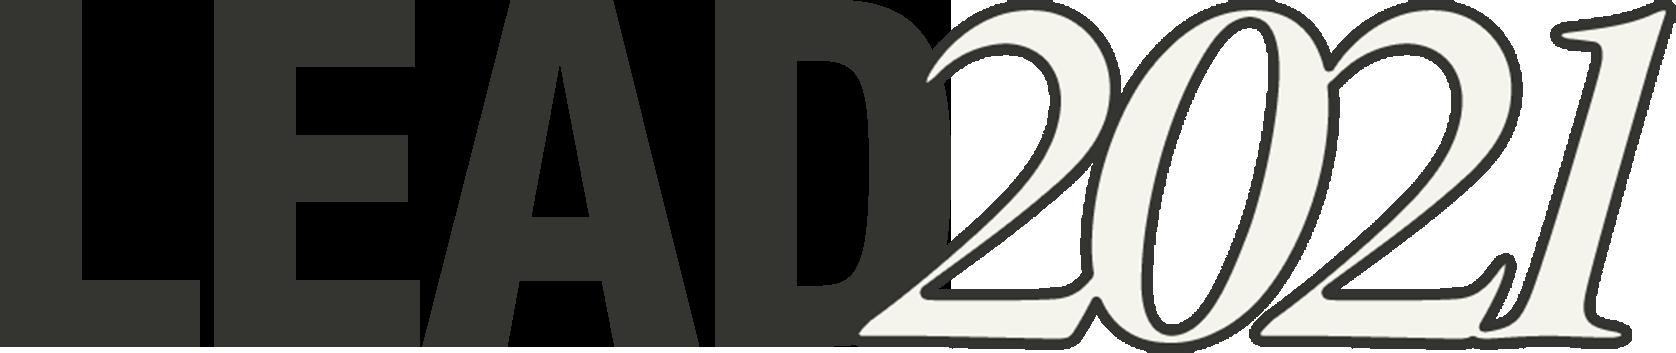 Lead2021